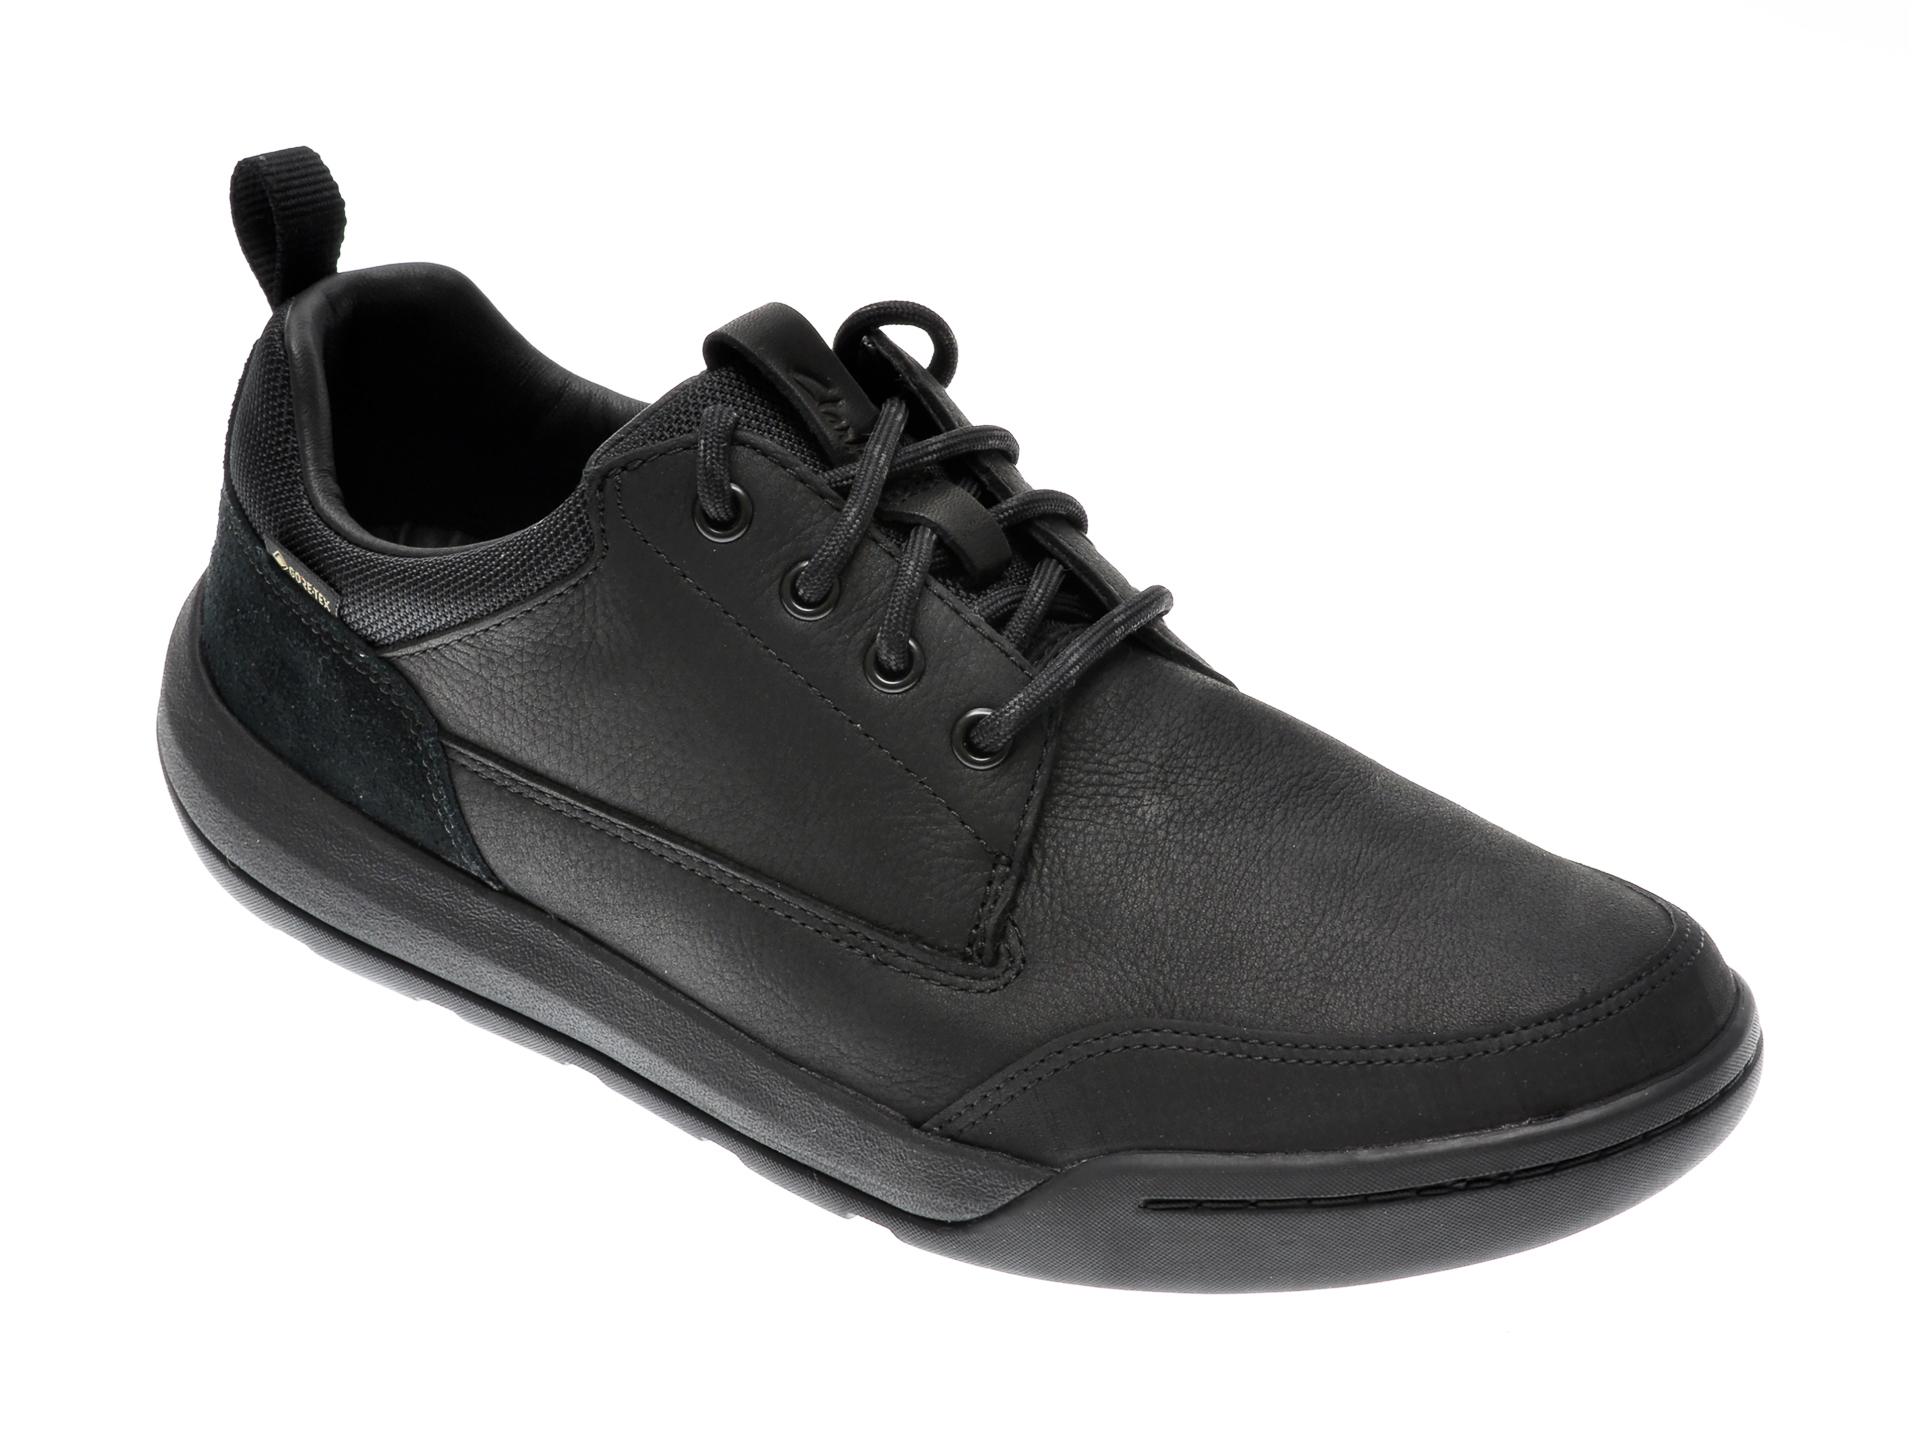 Pantofi CLARKS negri, ASHCOMBE LO GTX, din piele naturala imagine